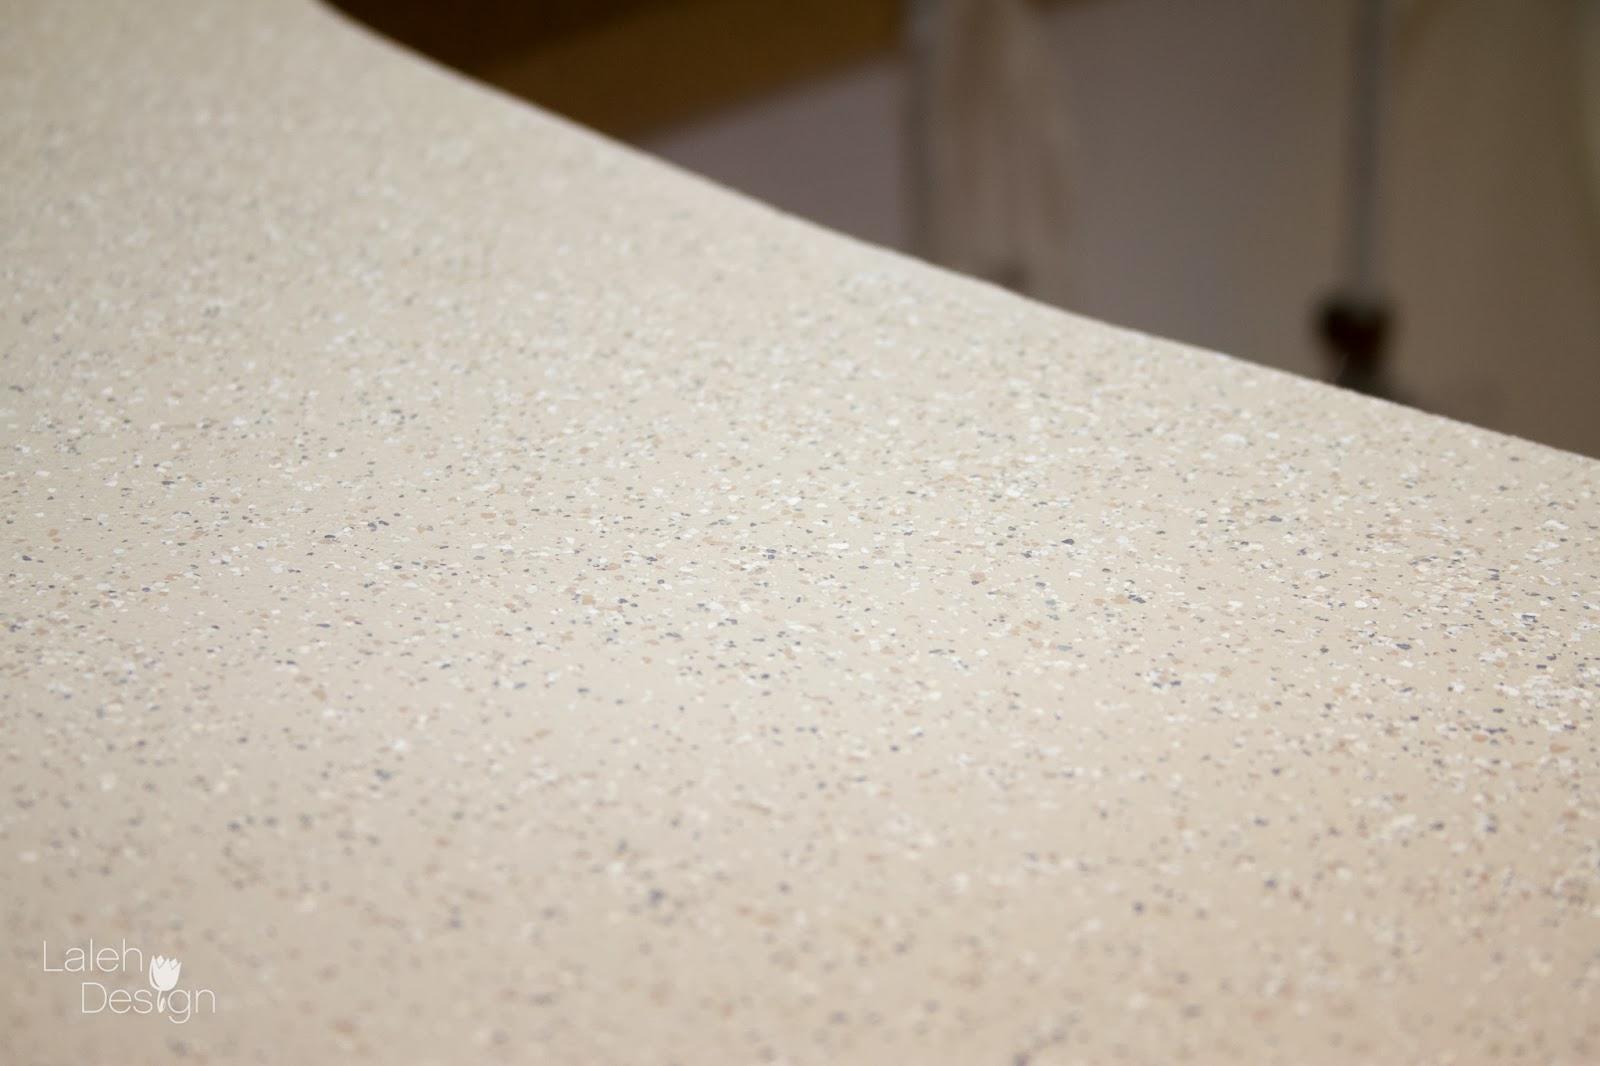 Beauti Tone Countertop Refinishing Kit